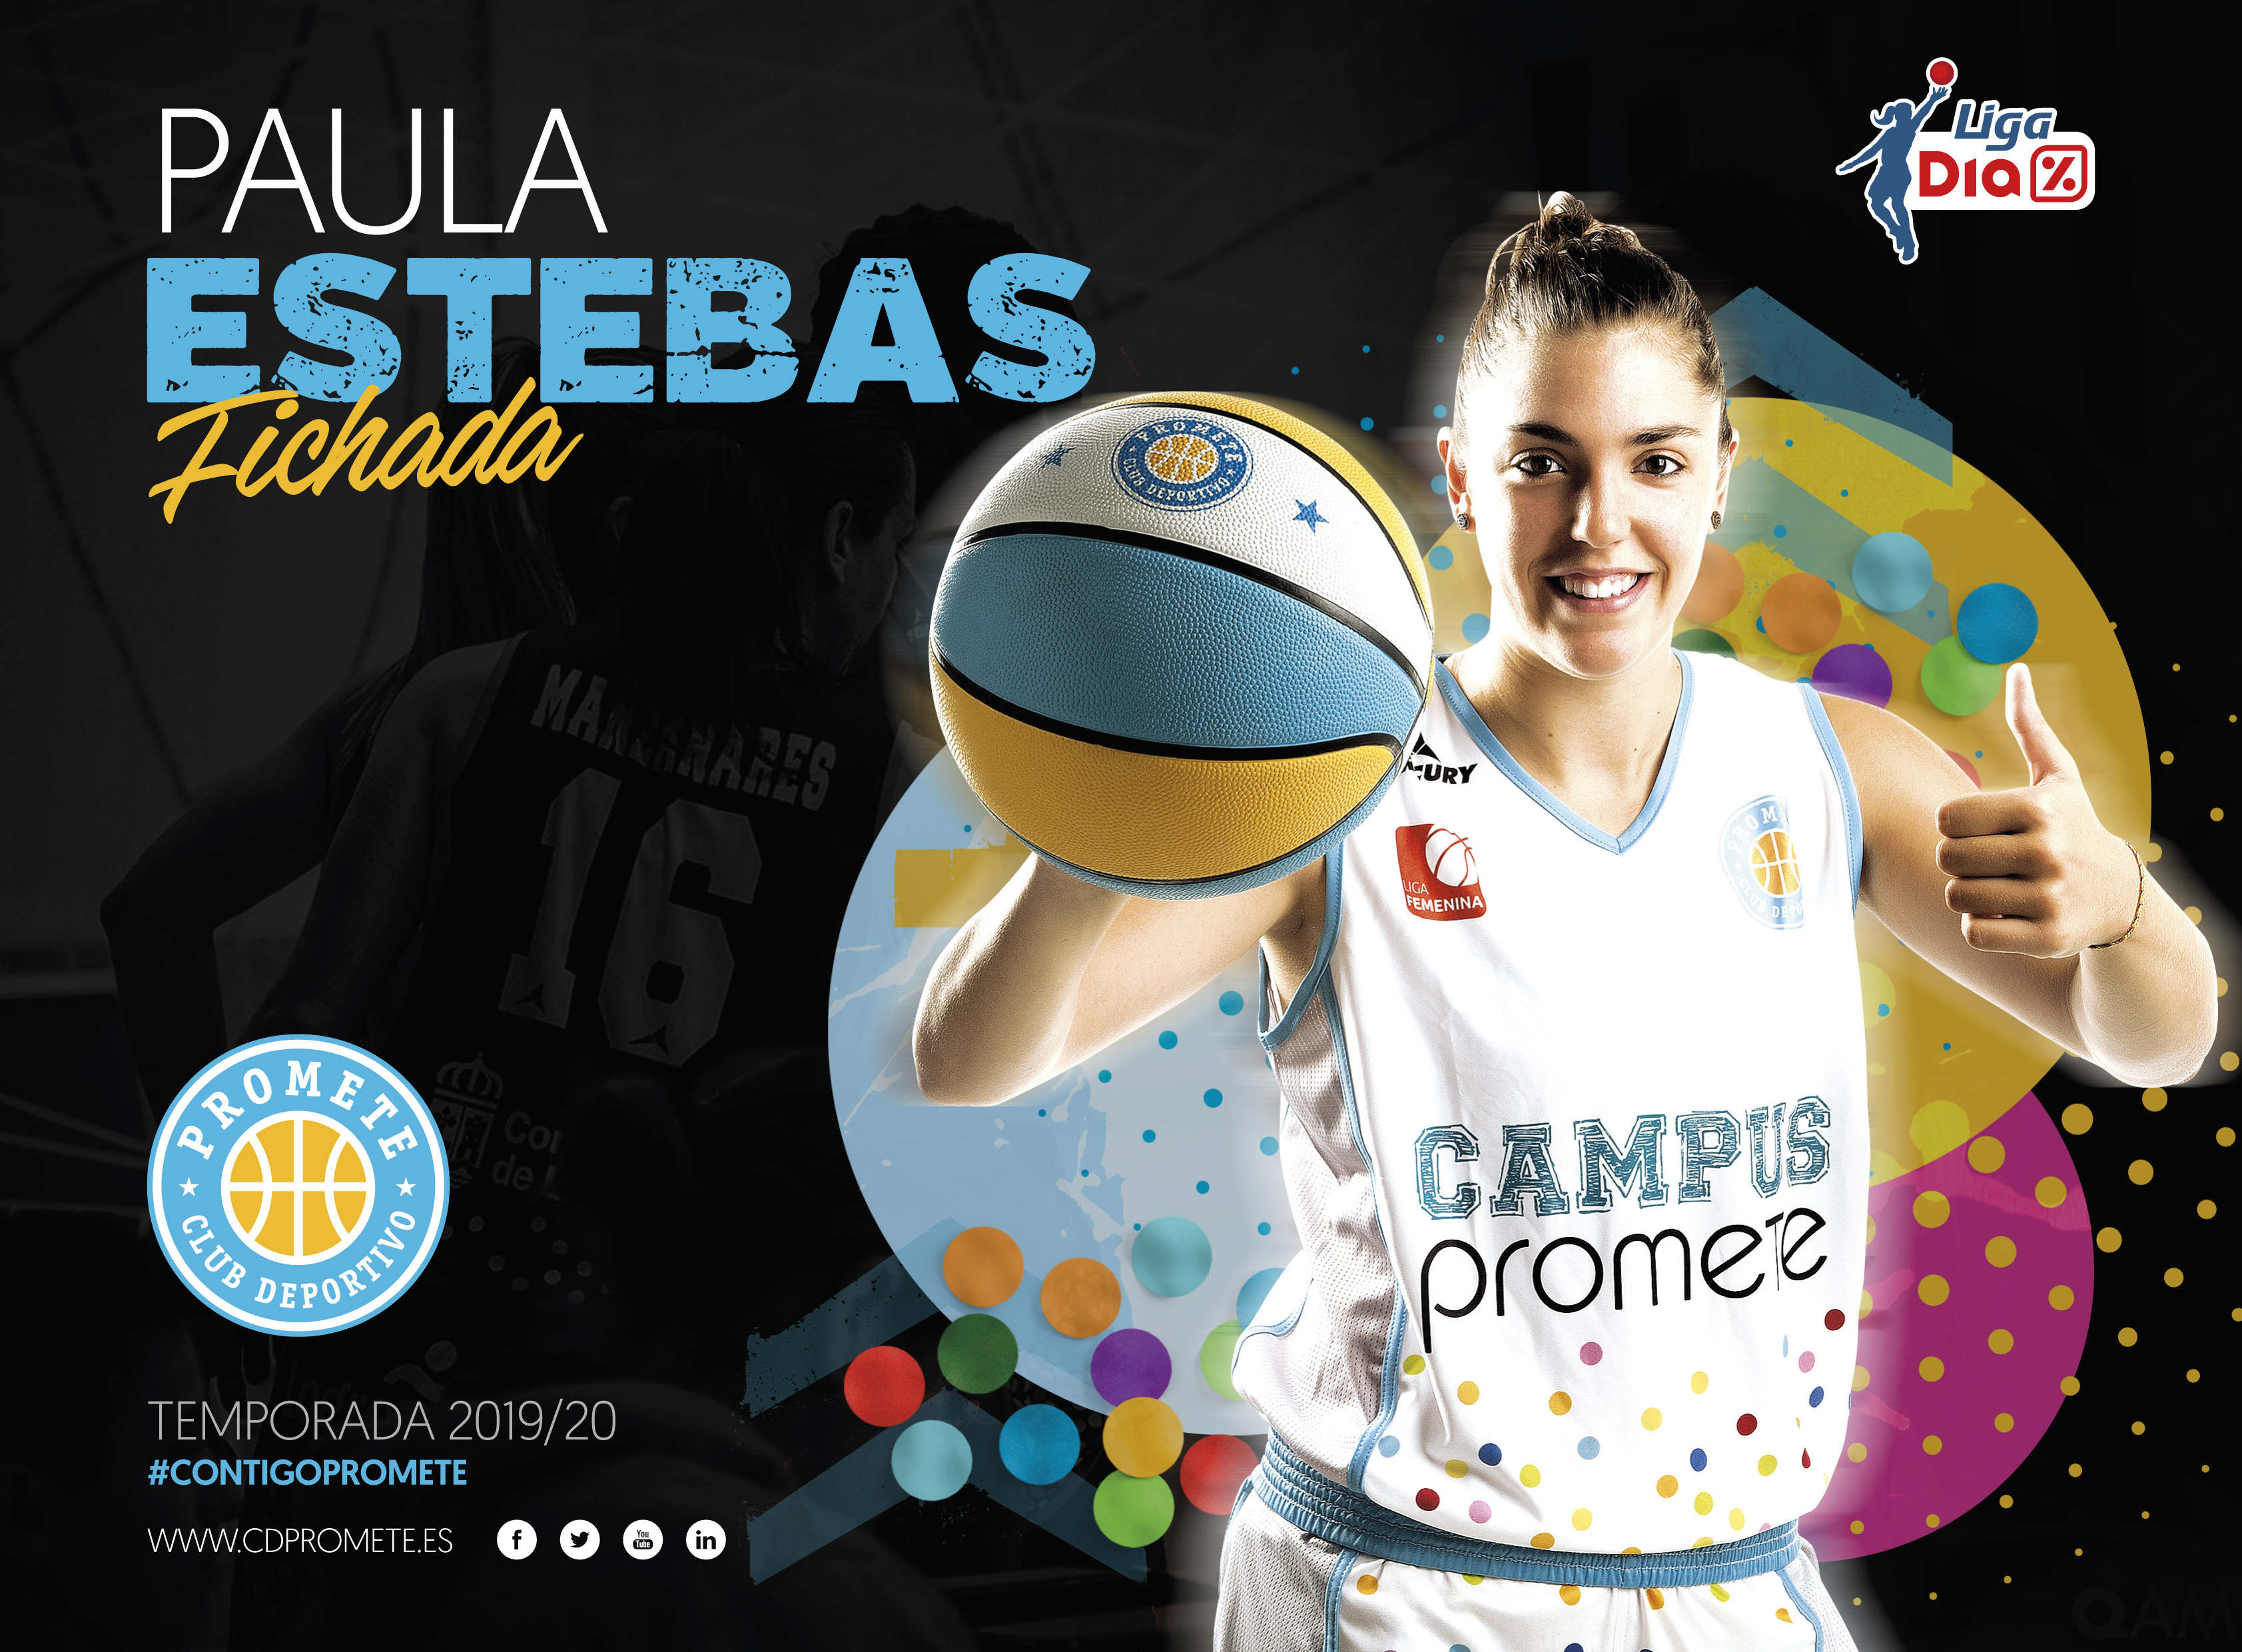 La riojana Paula Estebas regresa al Campus Promete para el reto de Liga DIA